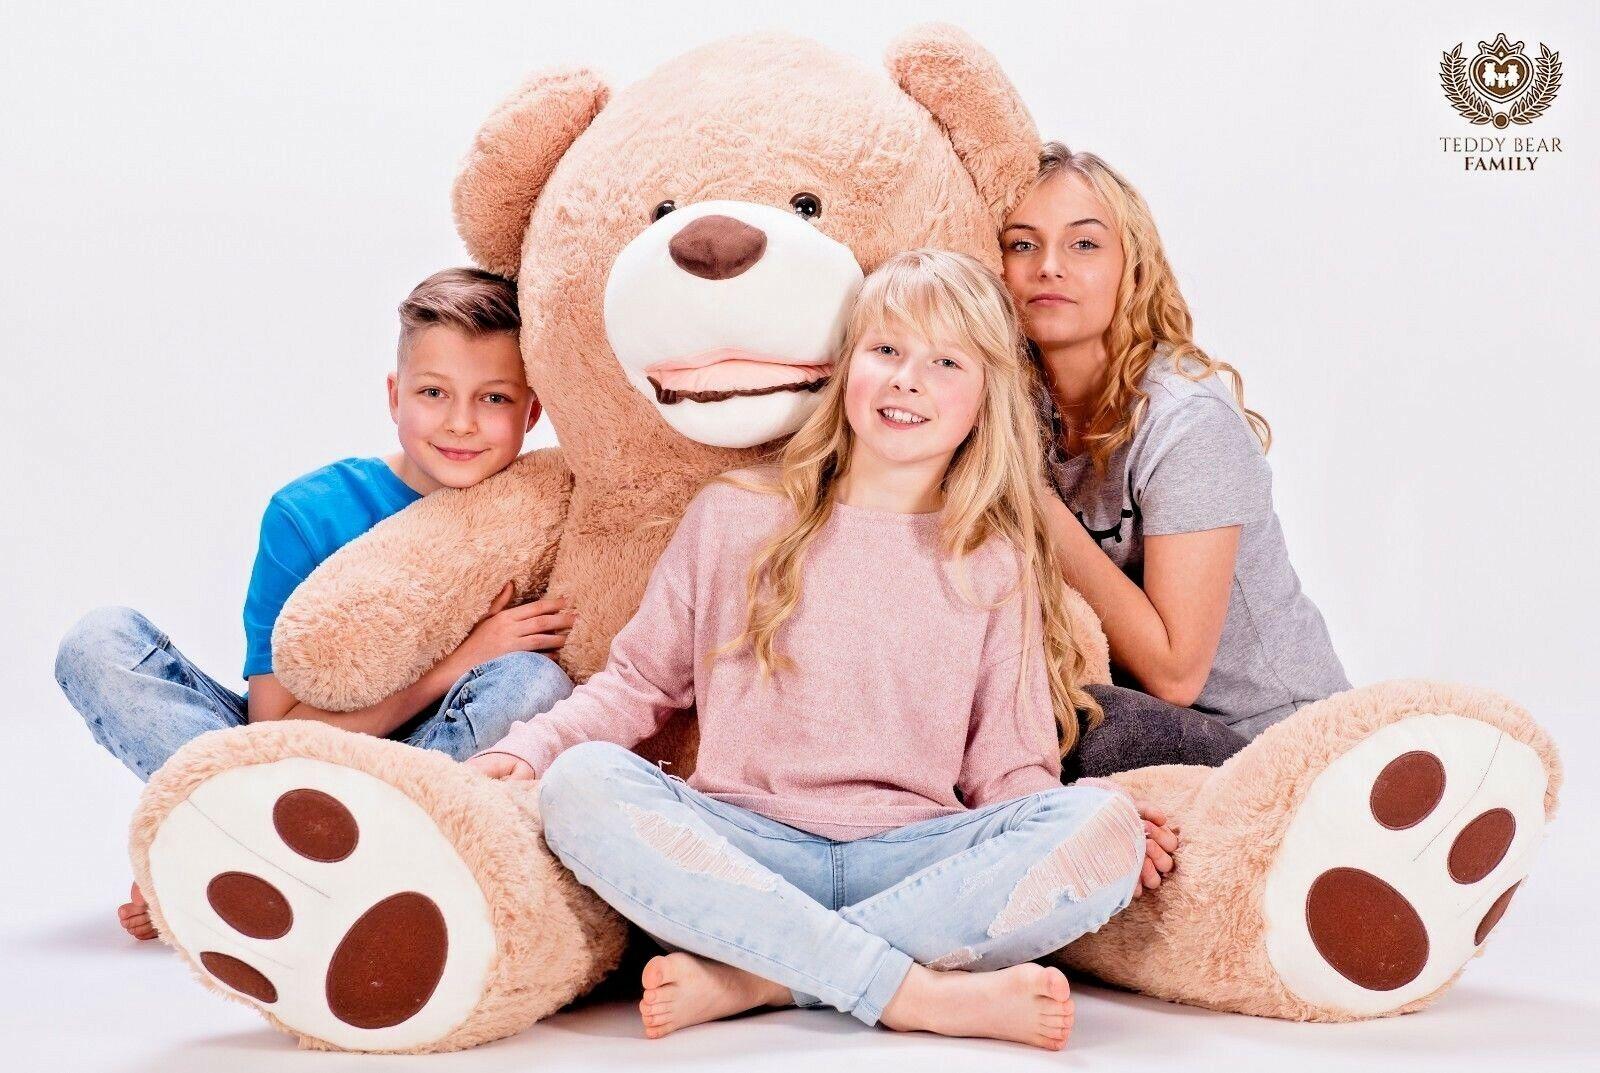 Teddybär XXL 160 cm Riesen Stofftier Plüschtier Groß XL Teddy Bär Geschenke idee  | Ausgang